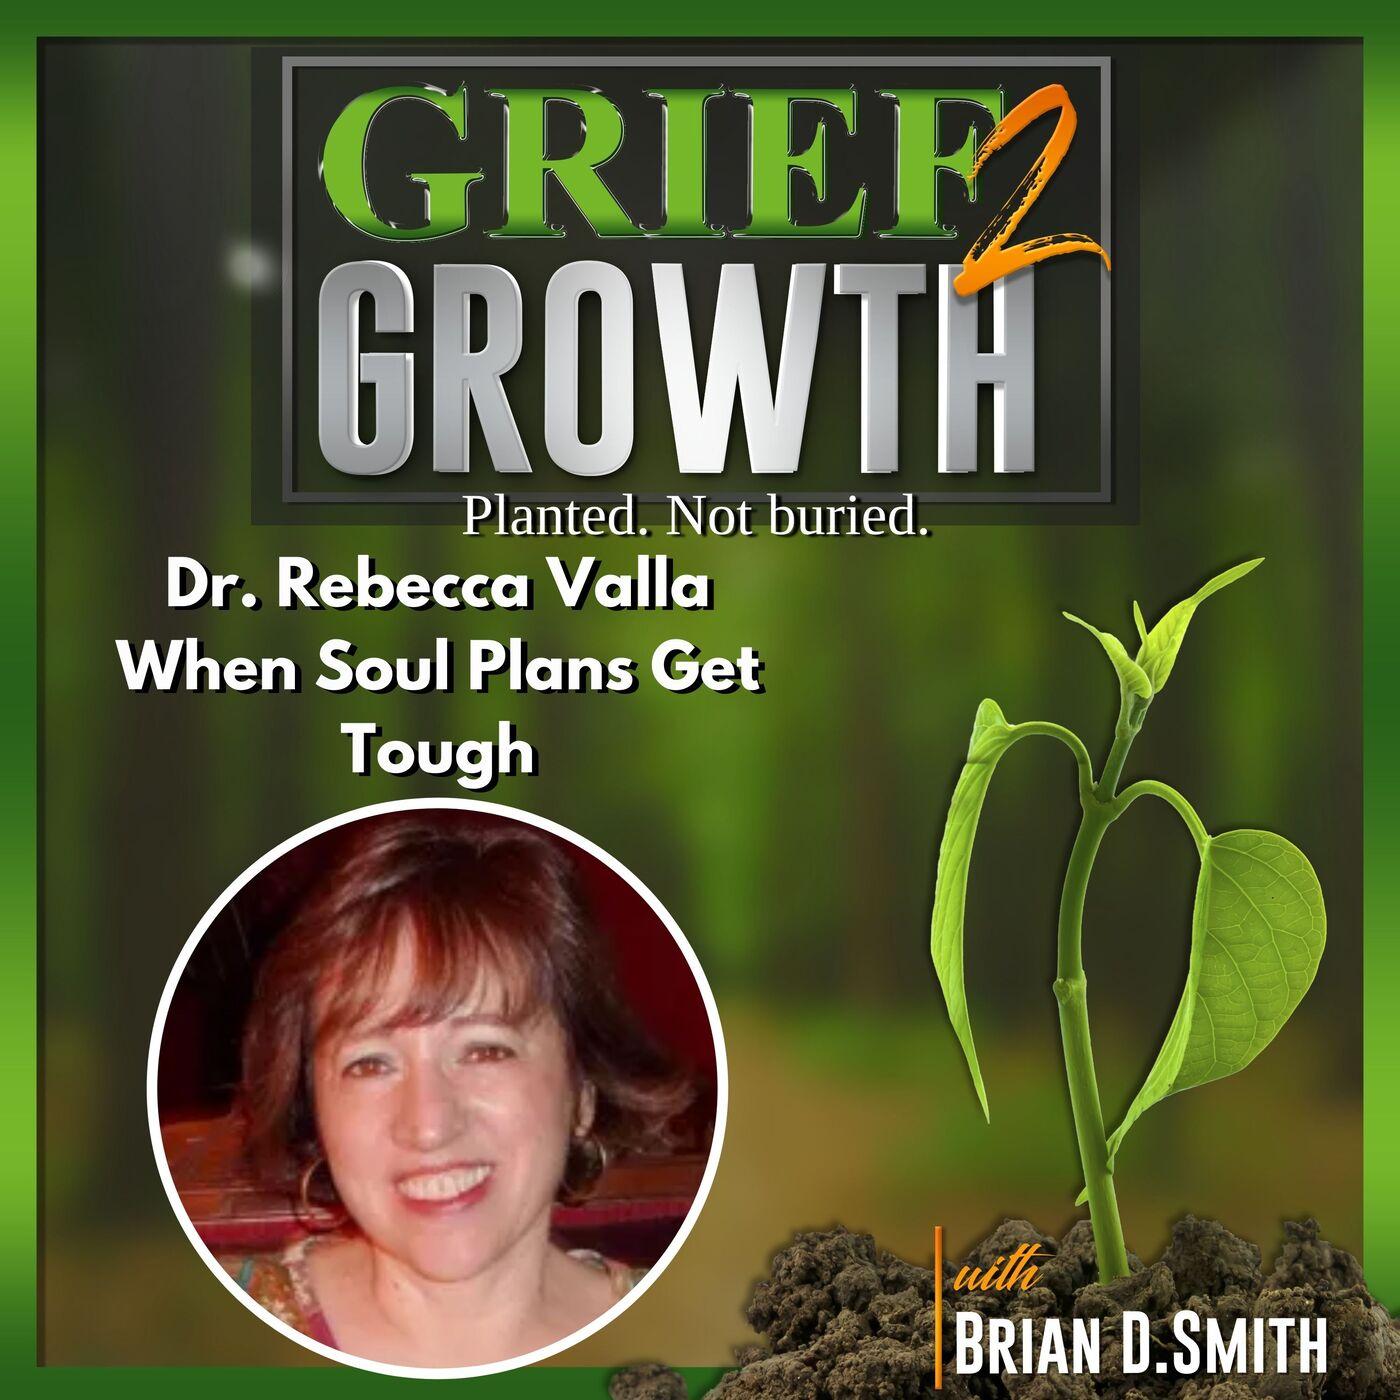 Rebecca Valla- When Soul Plans Get Tough